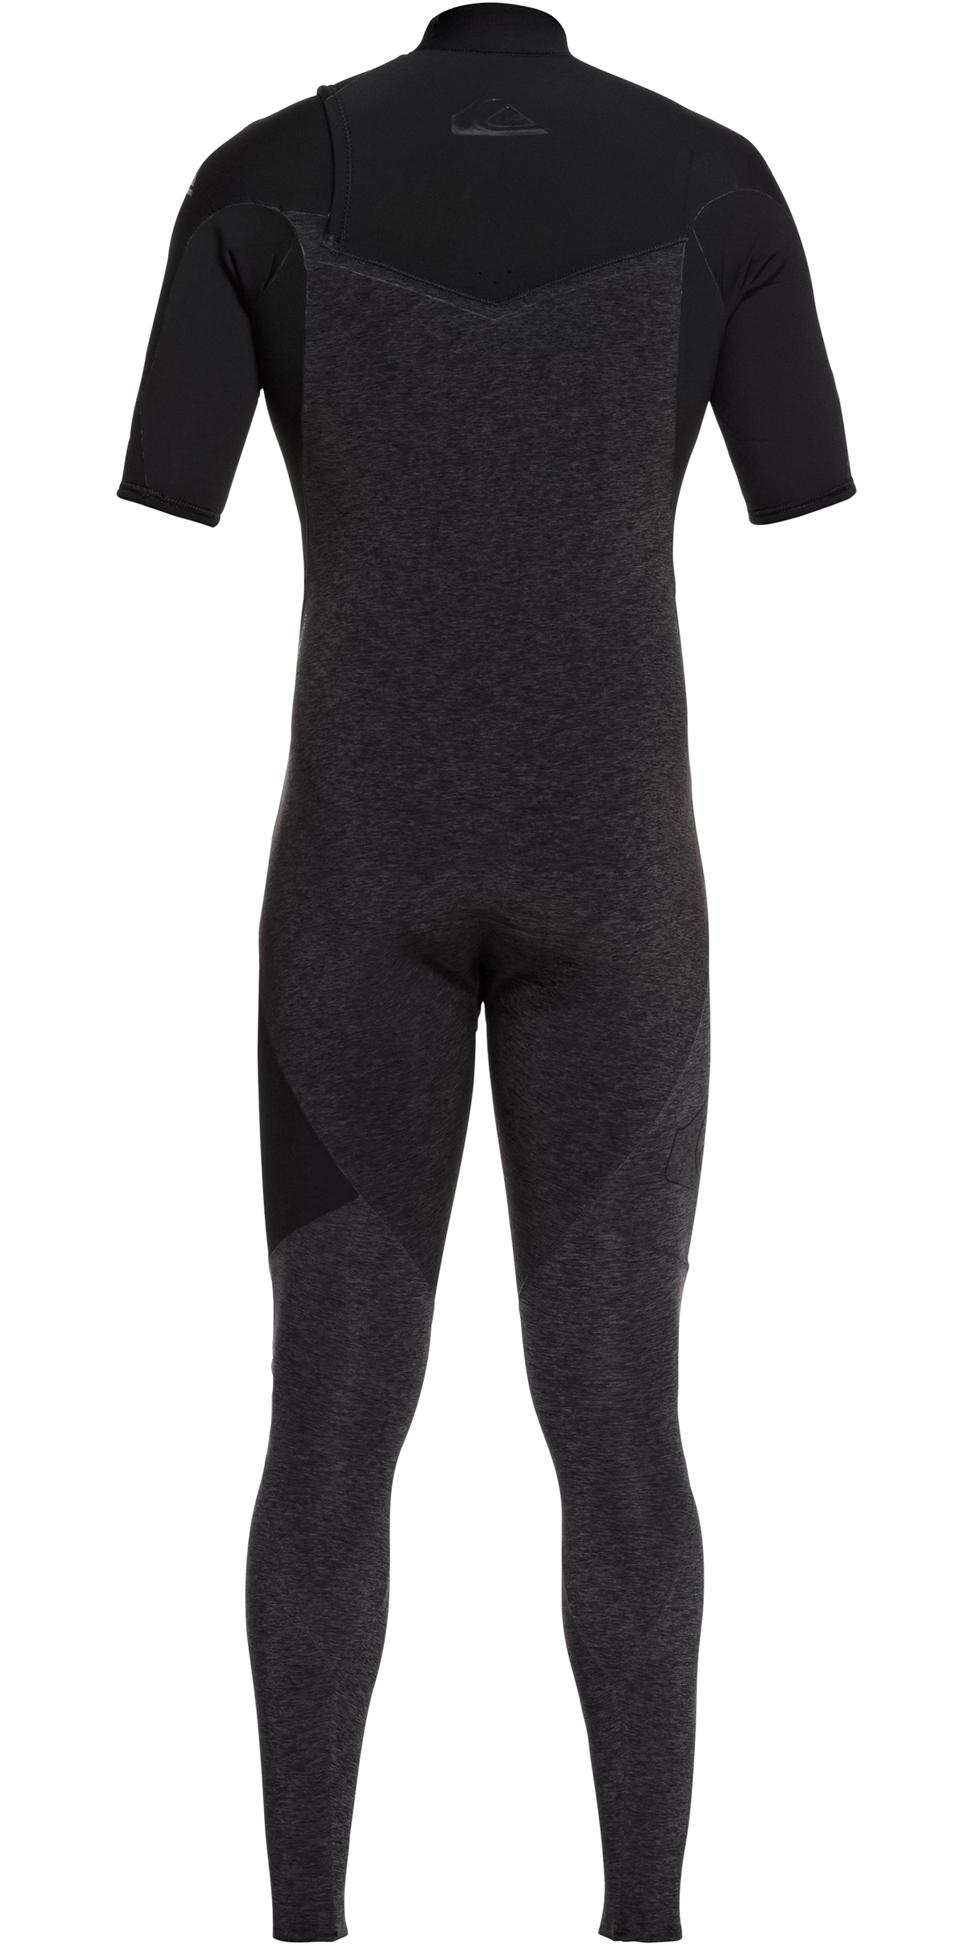 2019 Quiksilver Highline 2mm Zipperless Short Sleeve Wetsuit Black EQYW303009